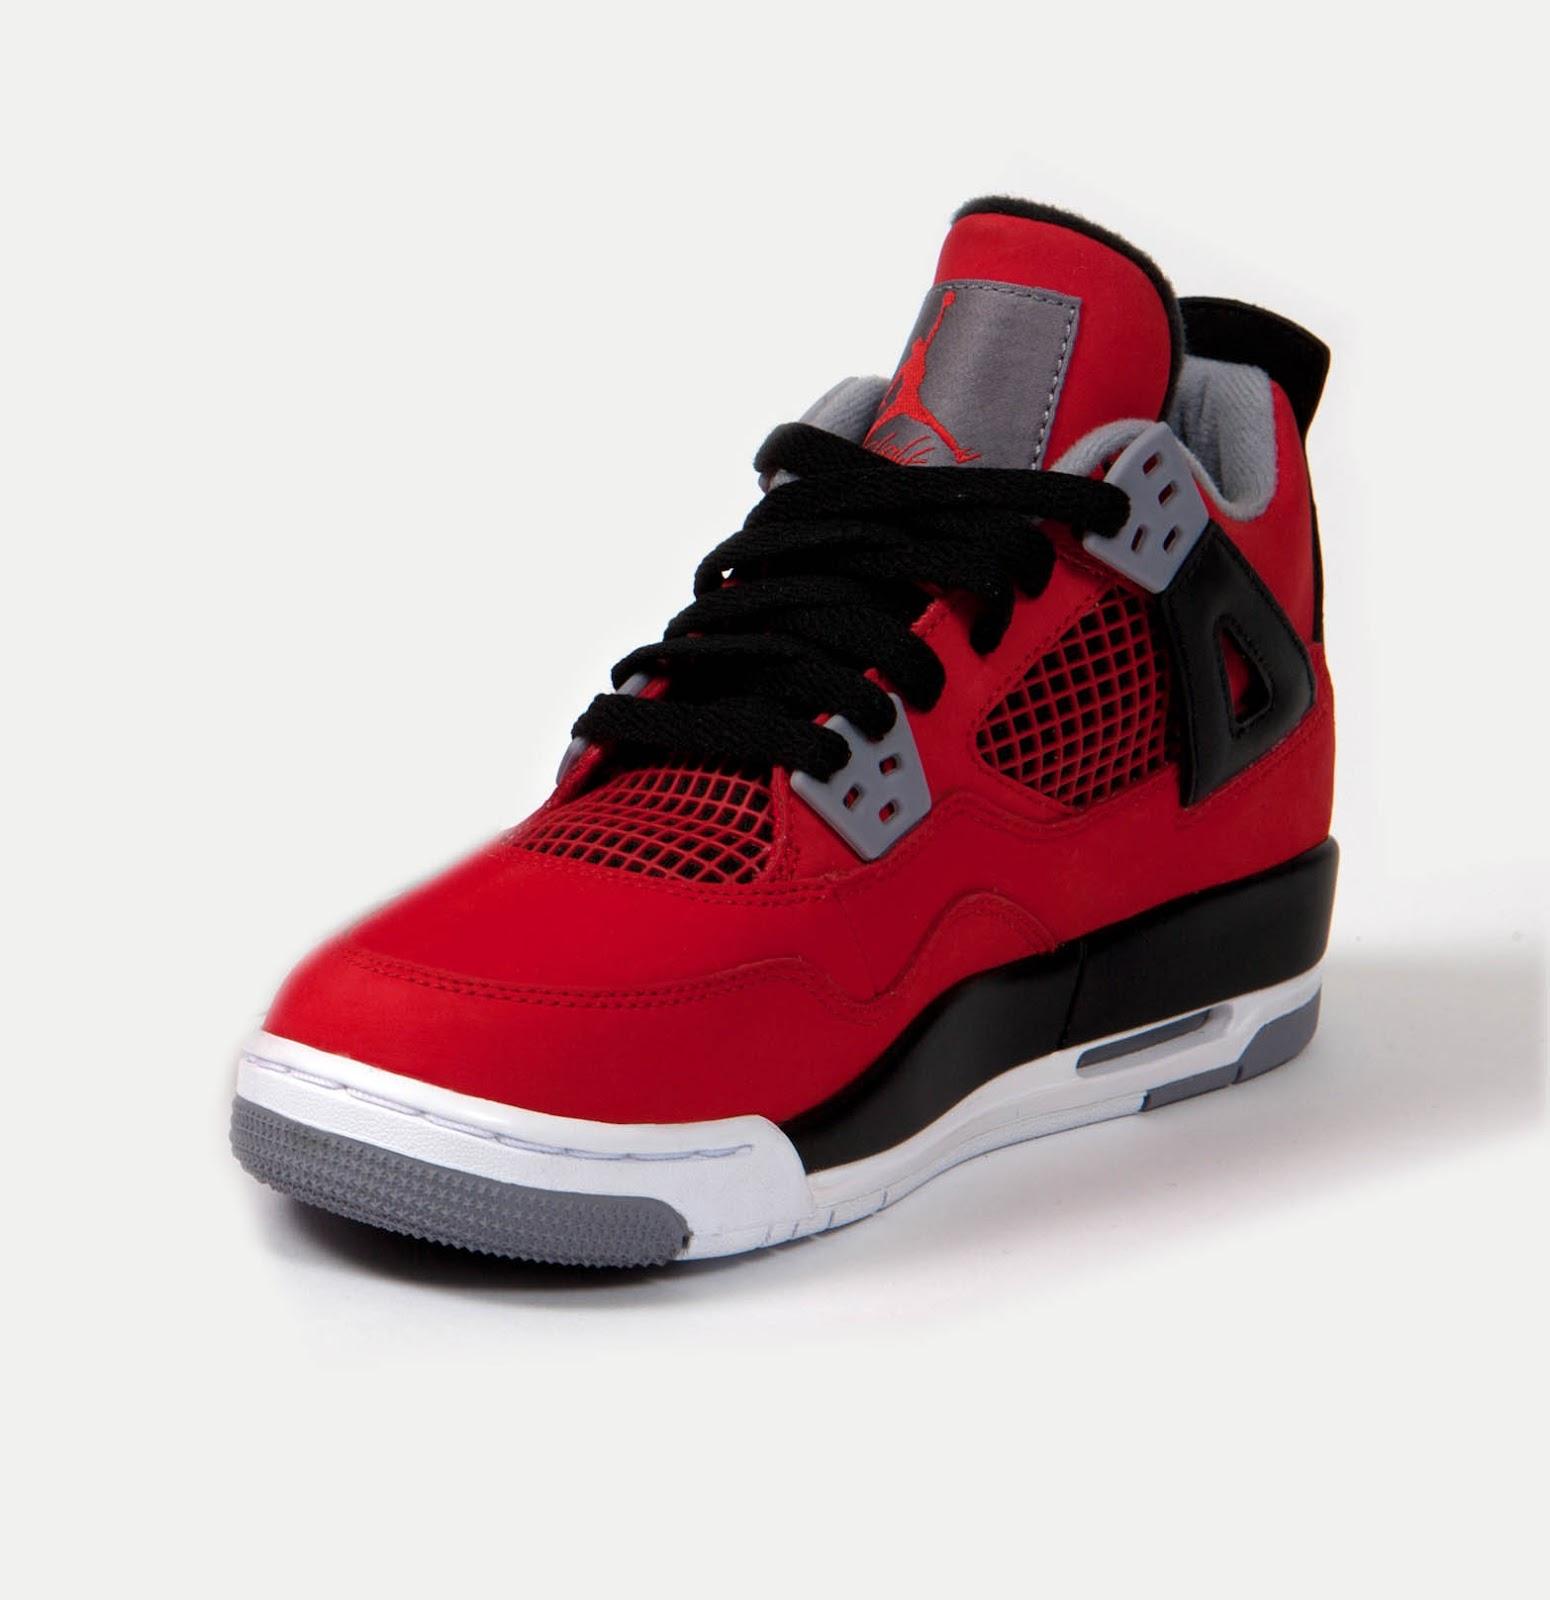 Jordan Shoes For Boys At Kids Foot Locker